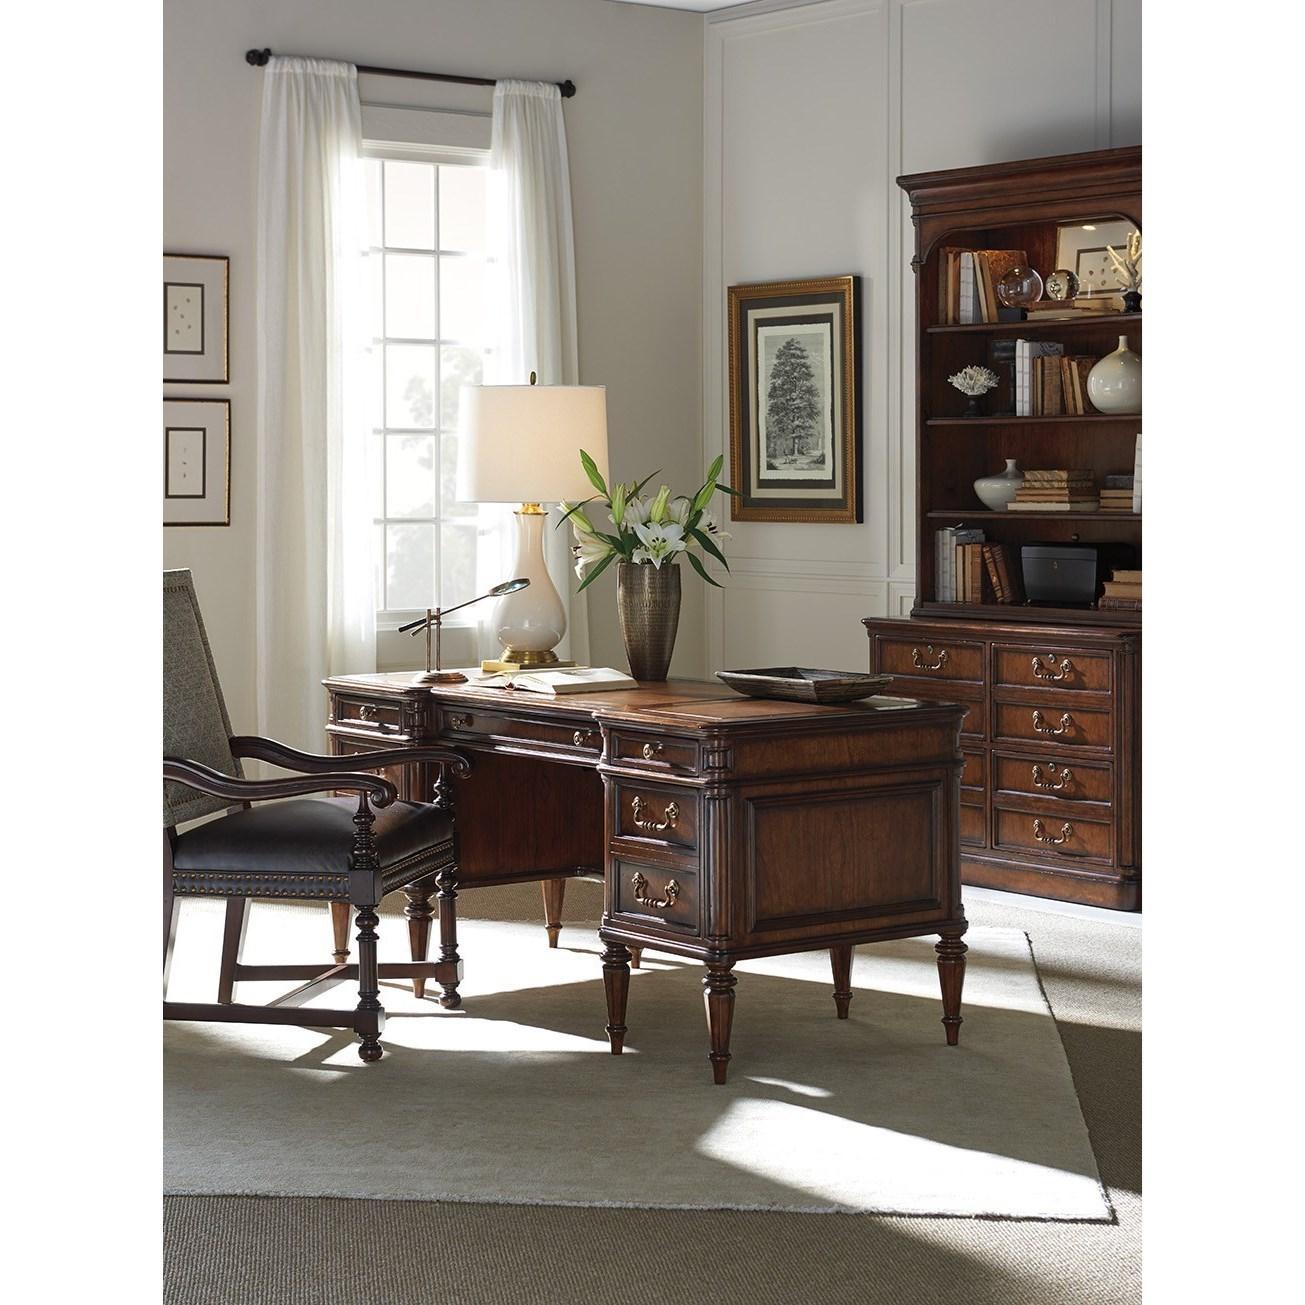 leather sofa richmond hill rv sleeper air mattress sligh 305 402 wesley desk with faux